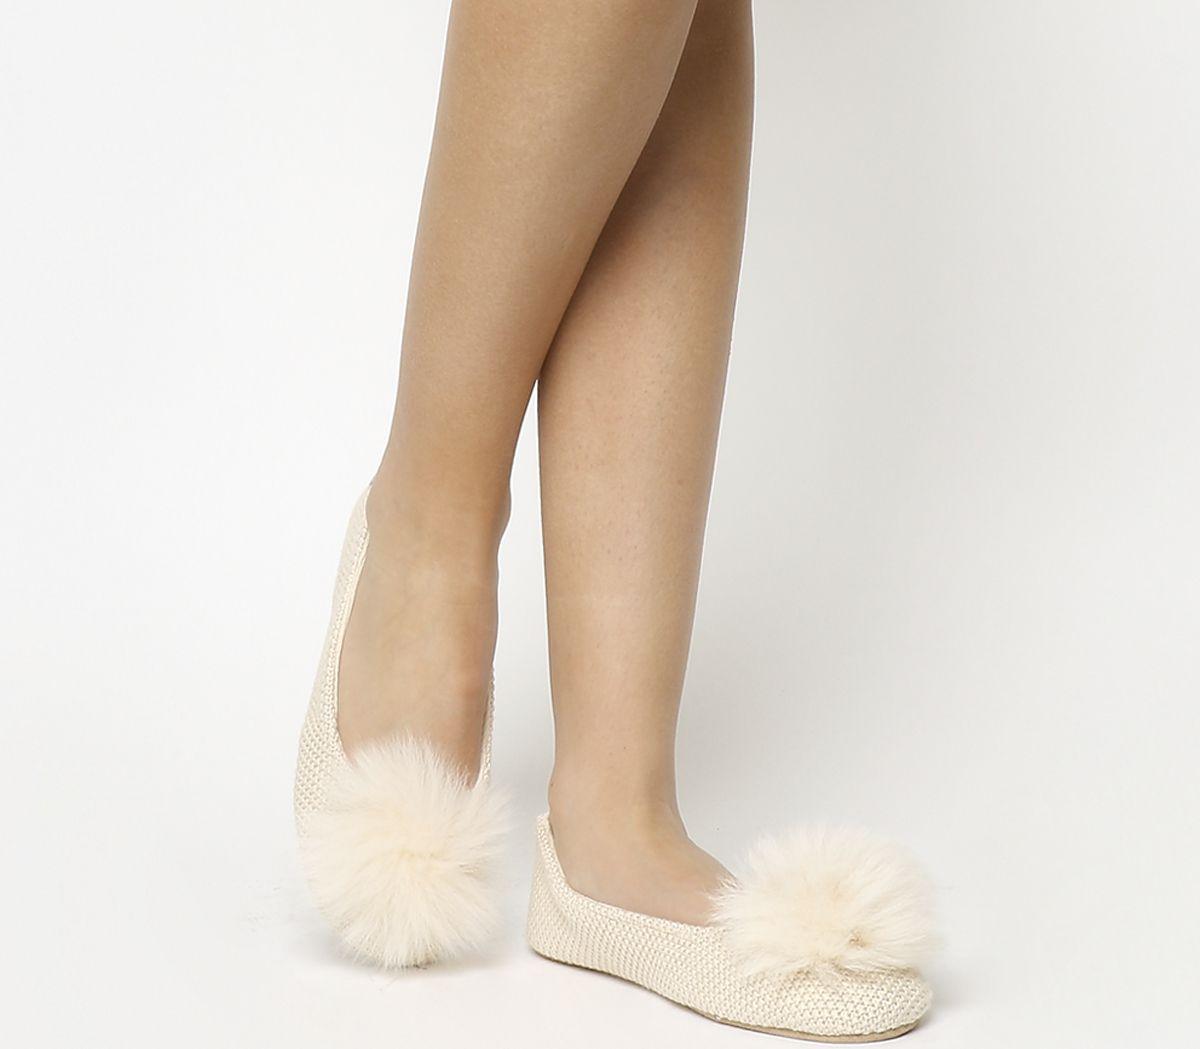 fc401c5115d Andi Slippers